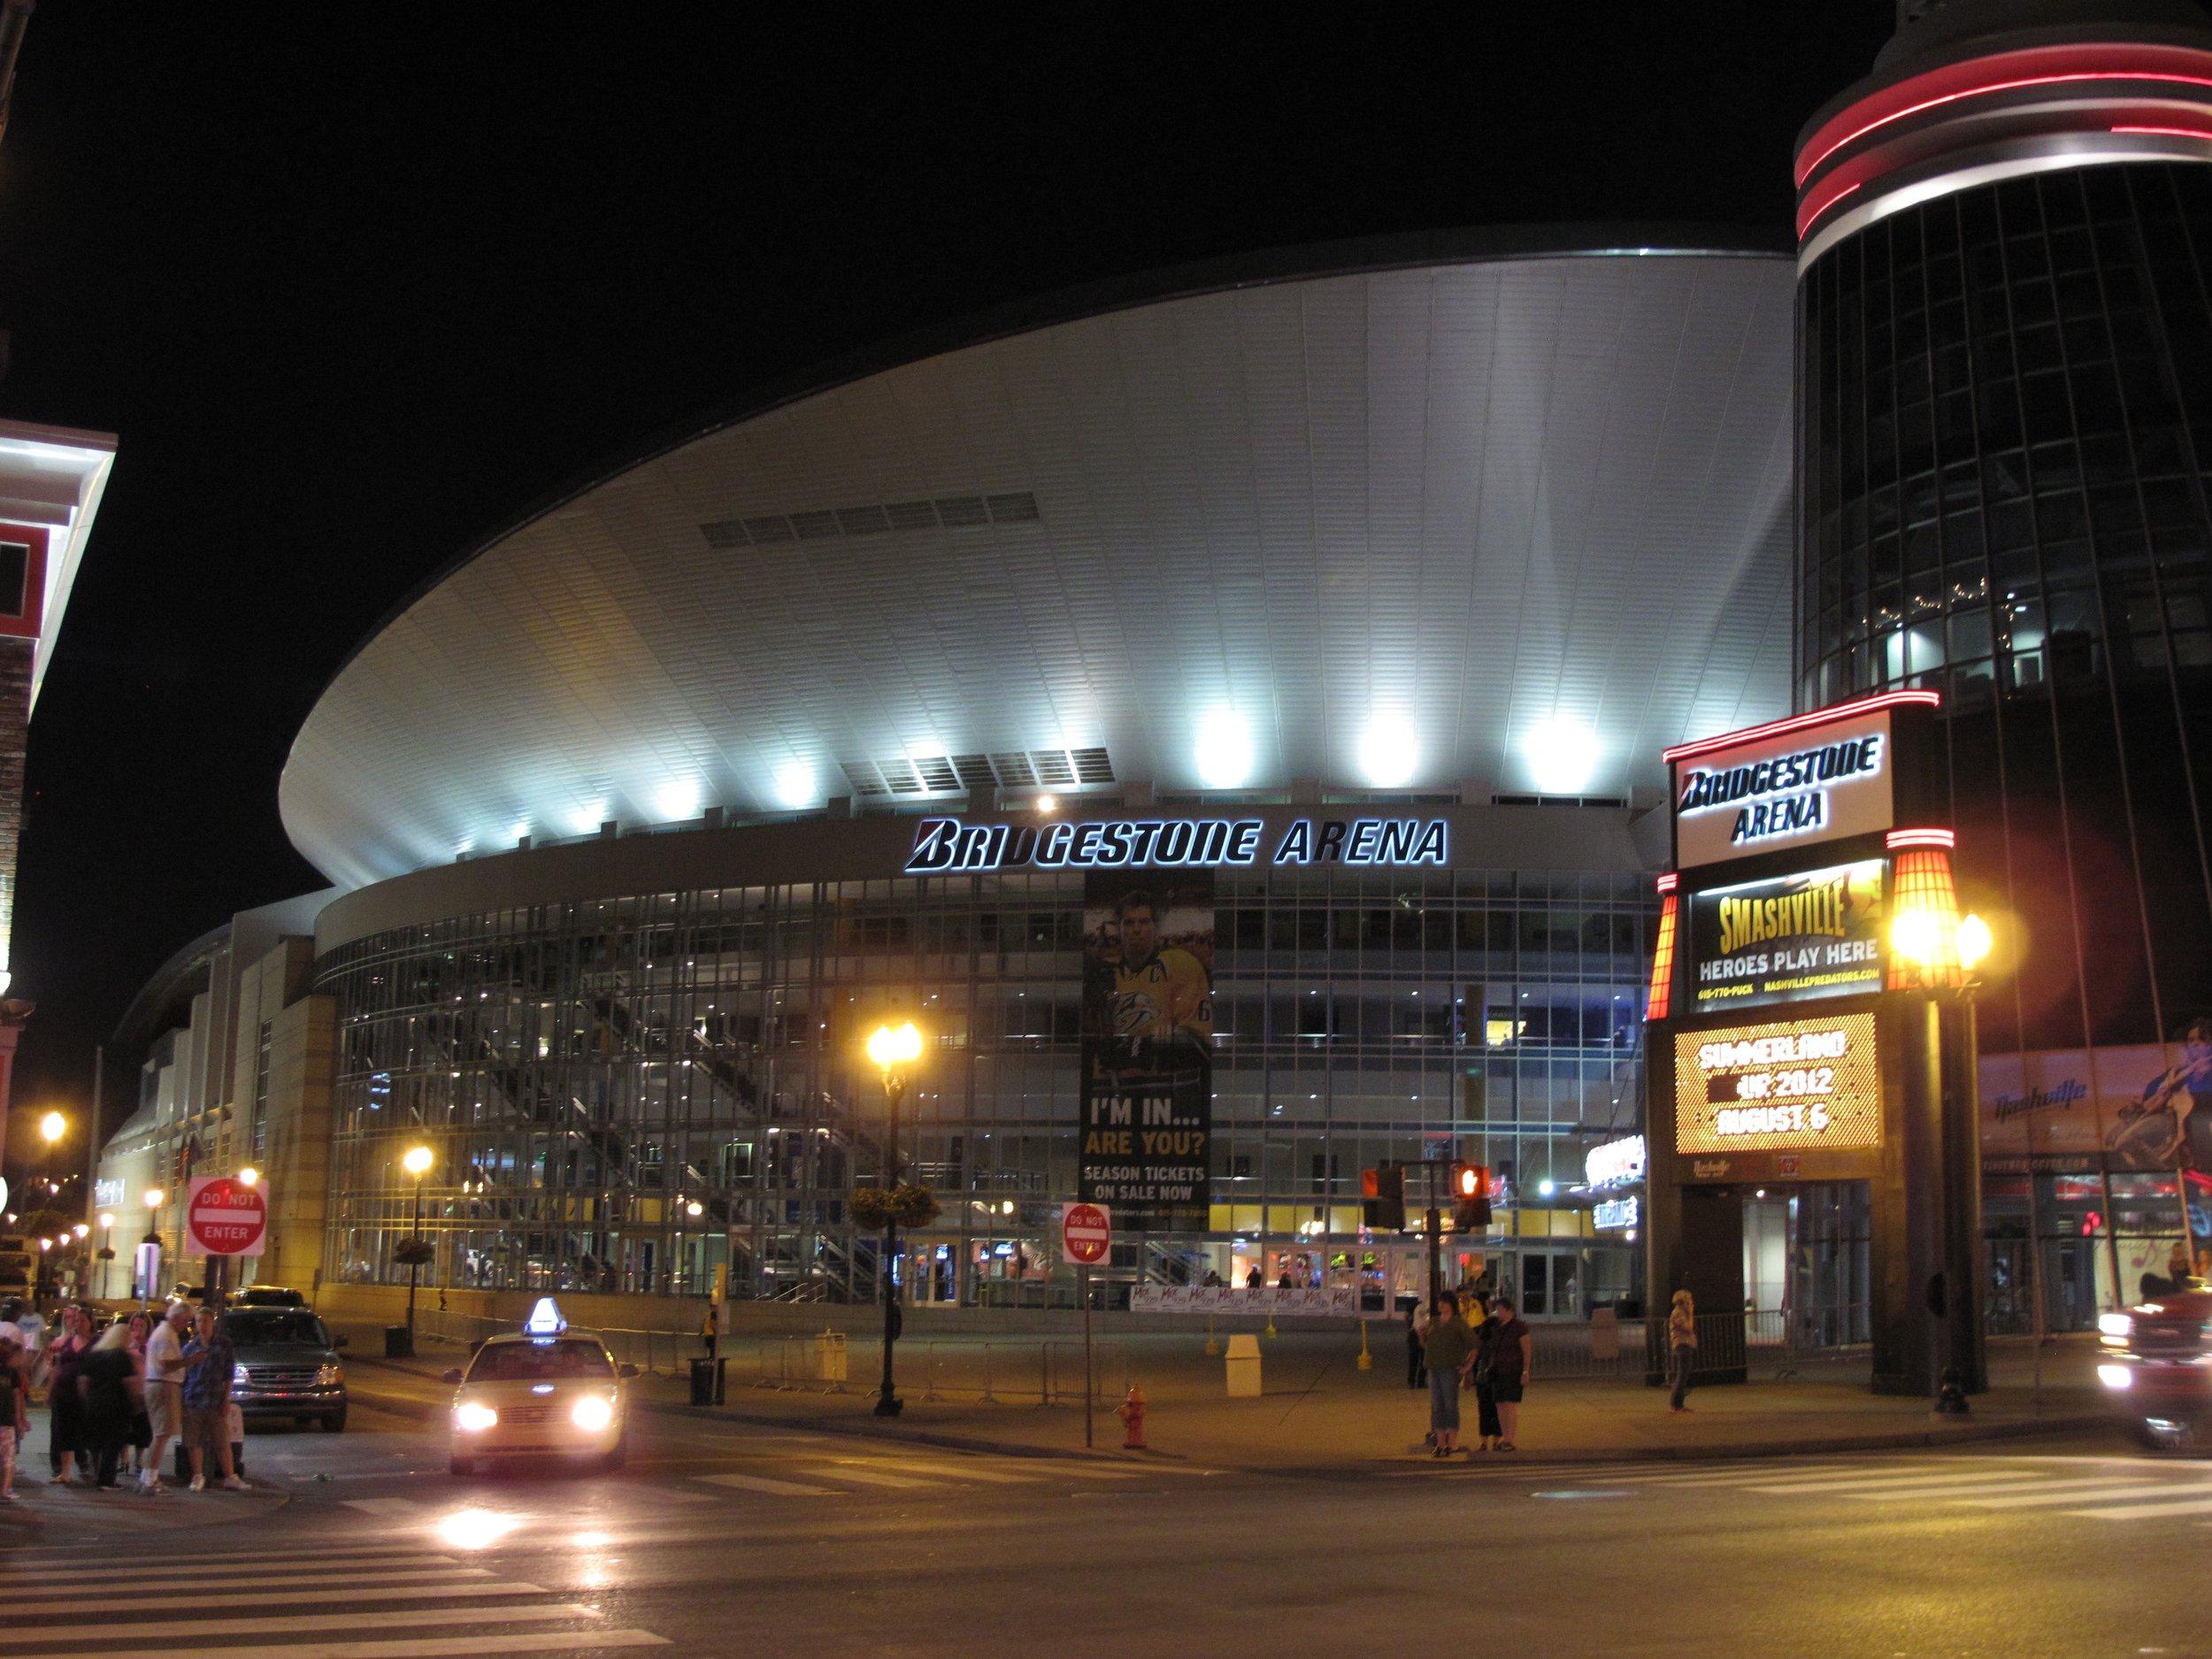 arena-360258.jpg